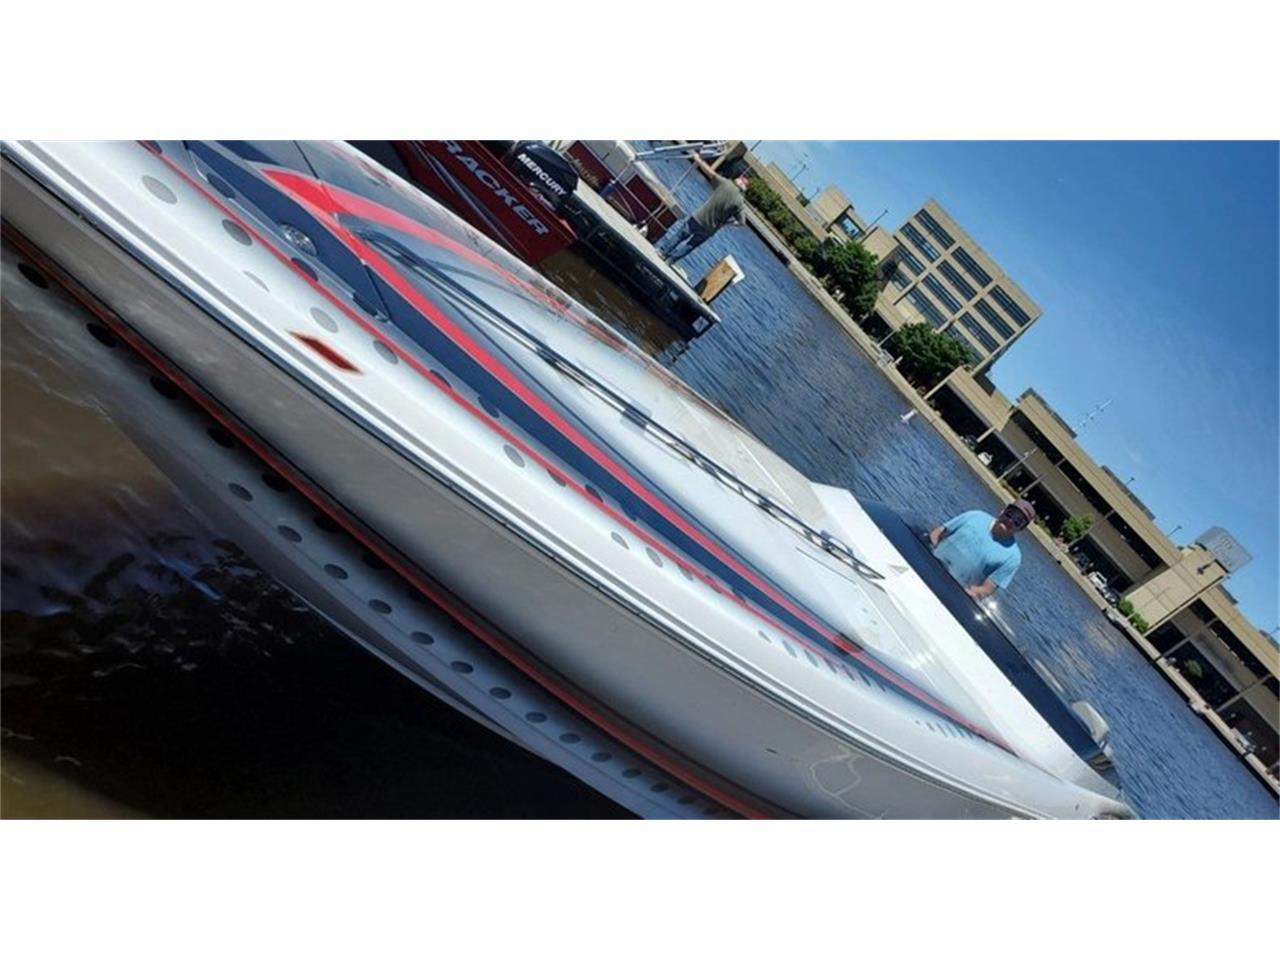 2009 Donzi Boat (CC-1418241) for sale in Punta Gorda, Florida